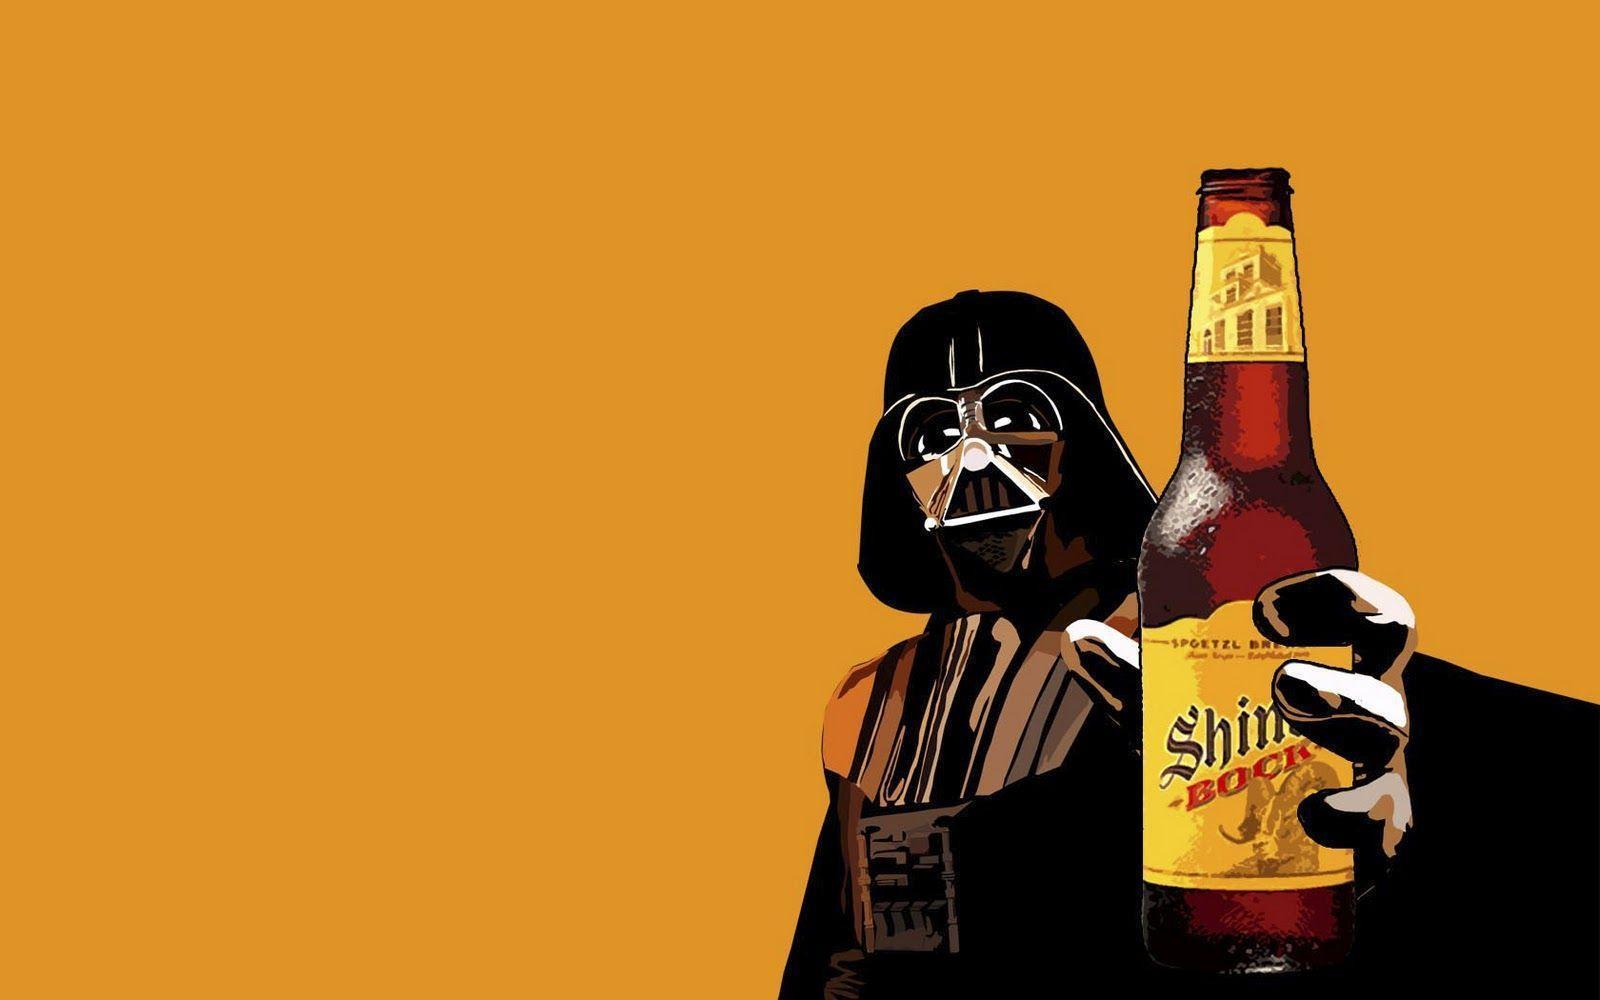 epic star wars trooper wallpaper - photo #30